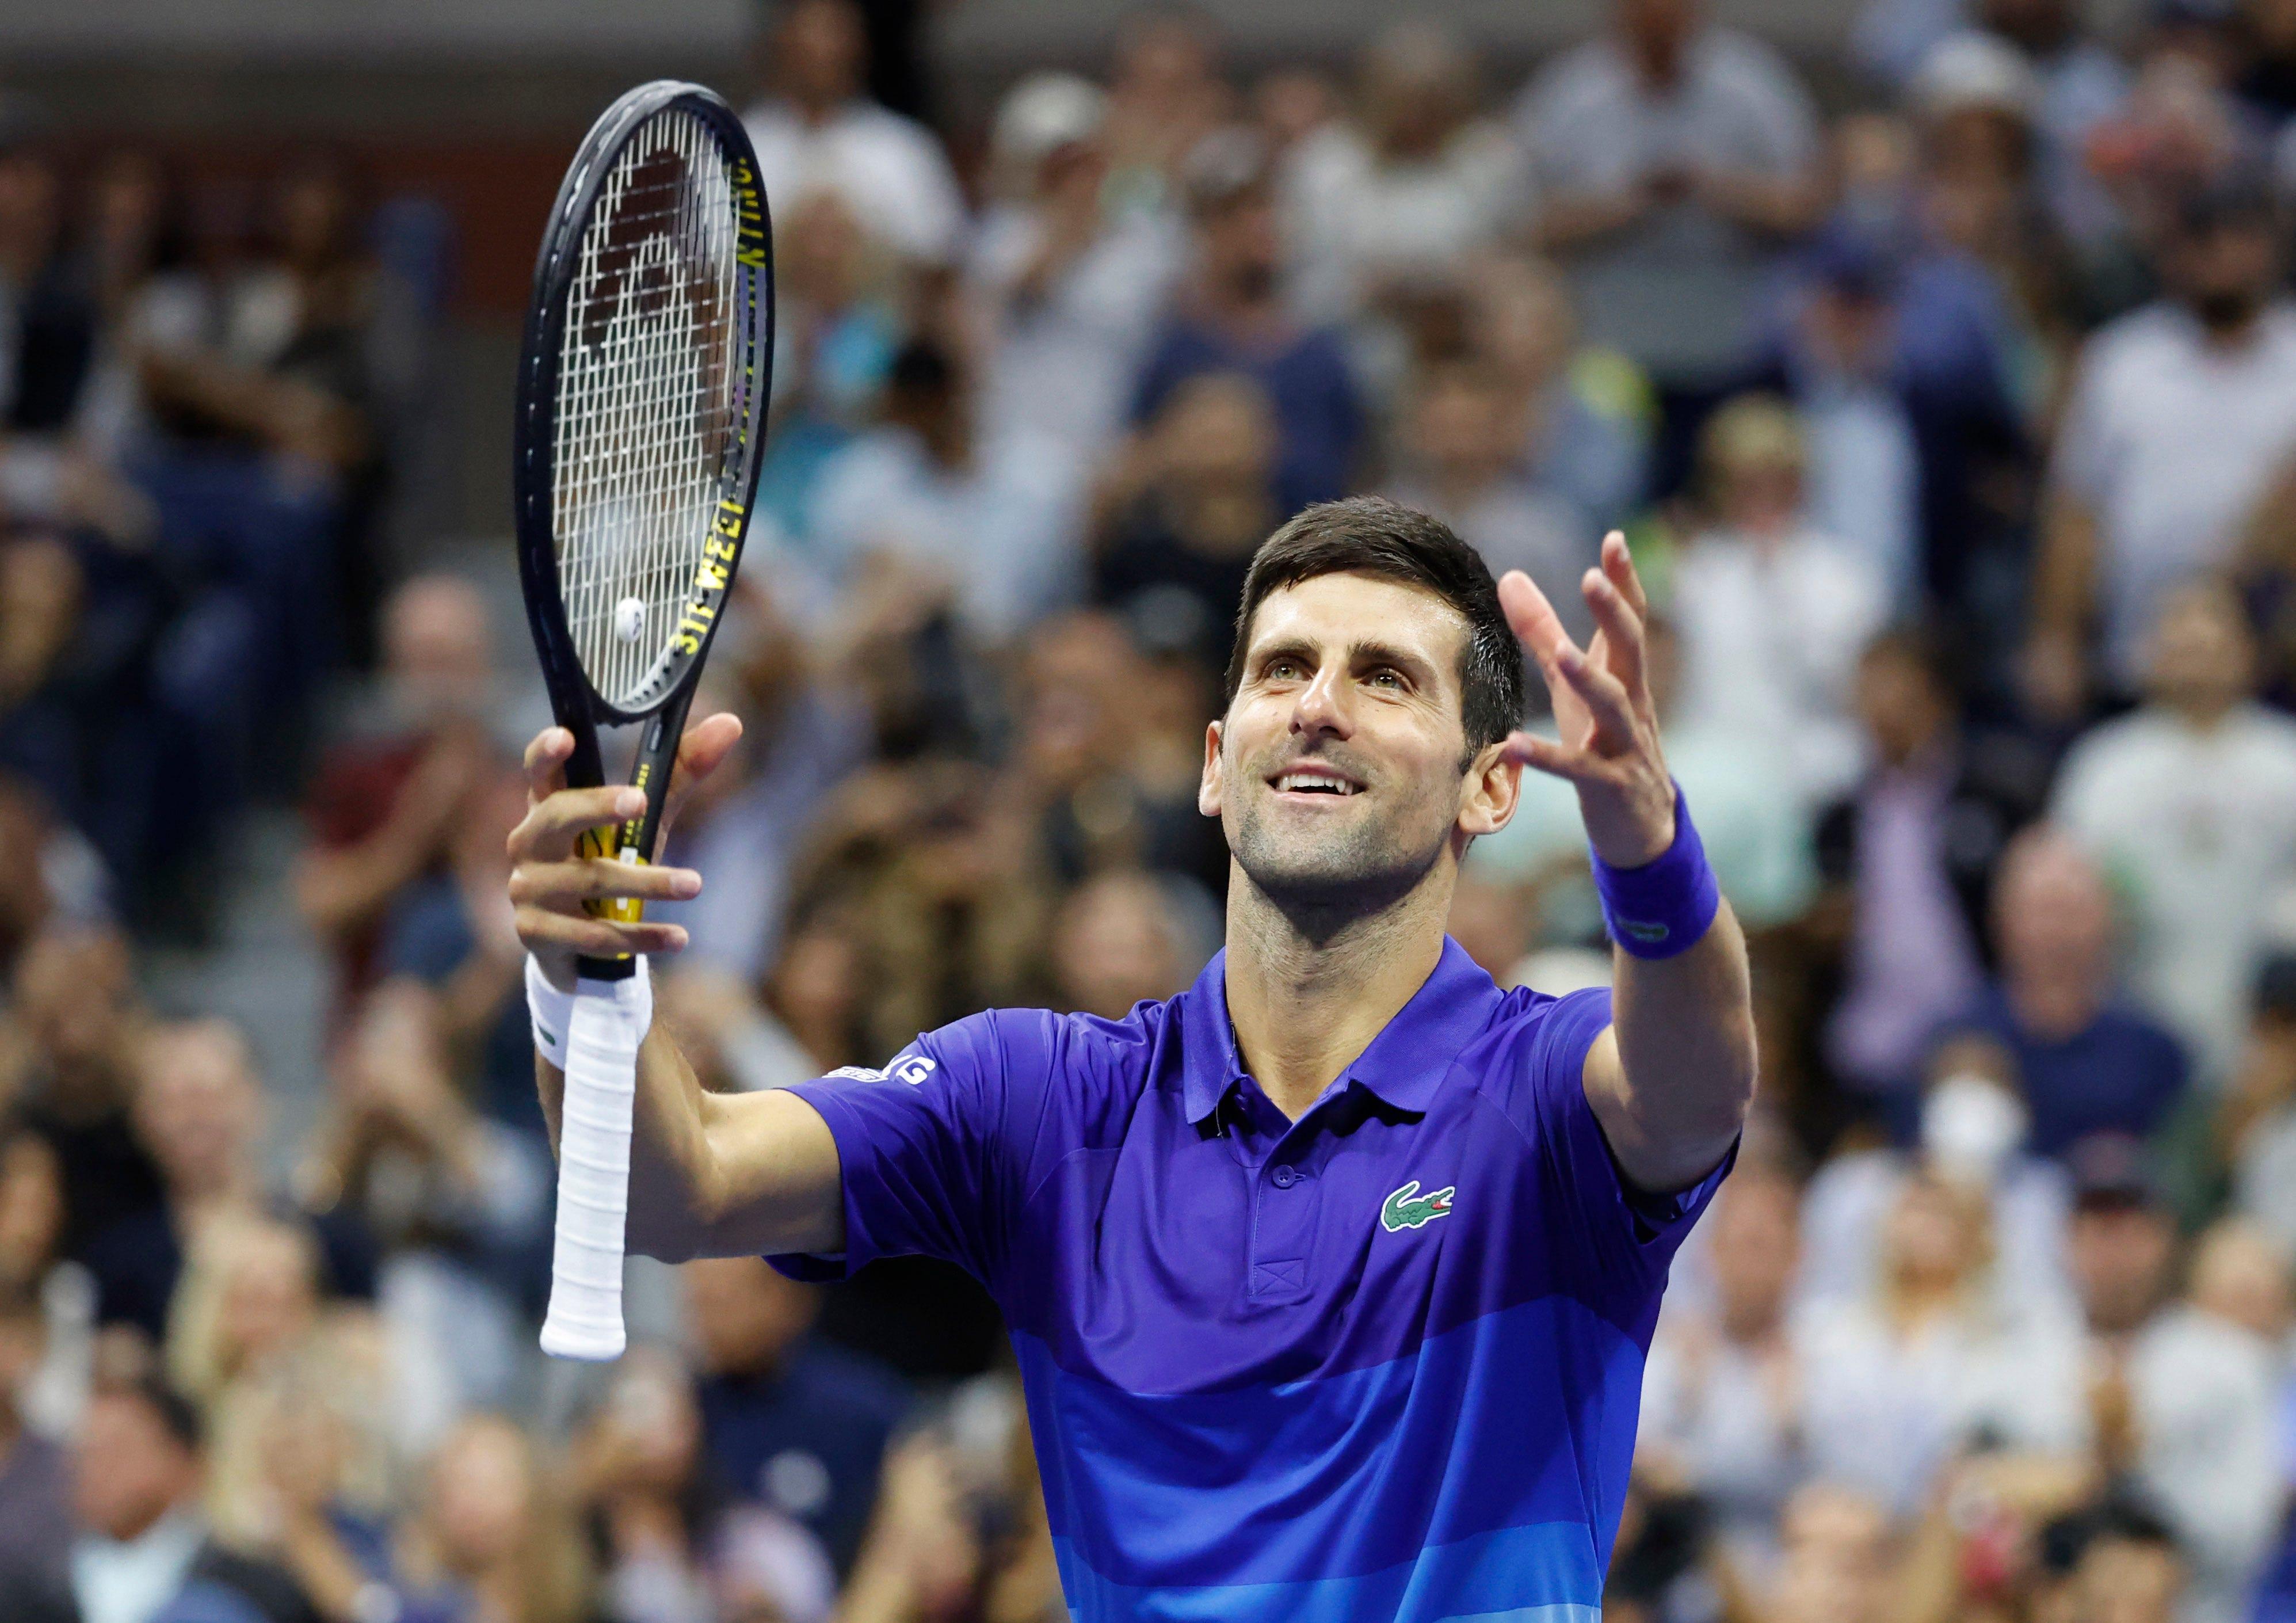 Novak Djokovic s magic number? Five. That s how many wins he needs for calendar-year Grand Slam.